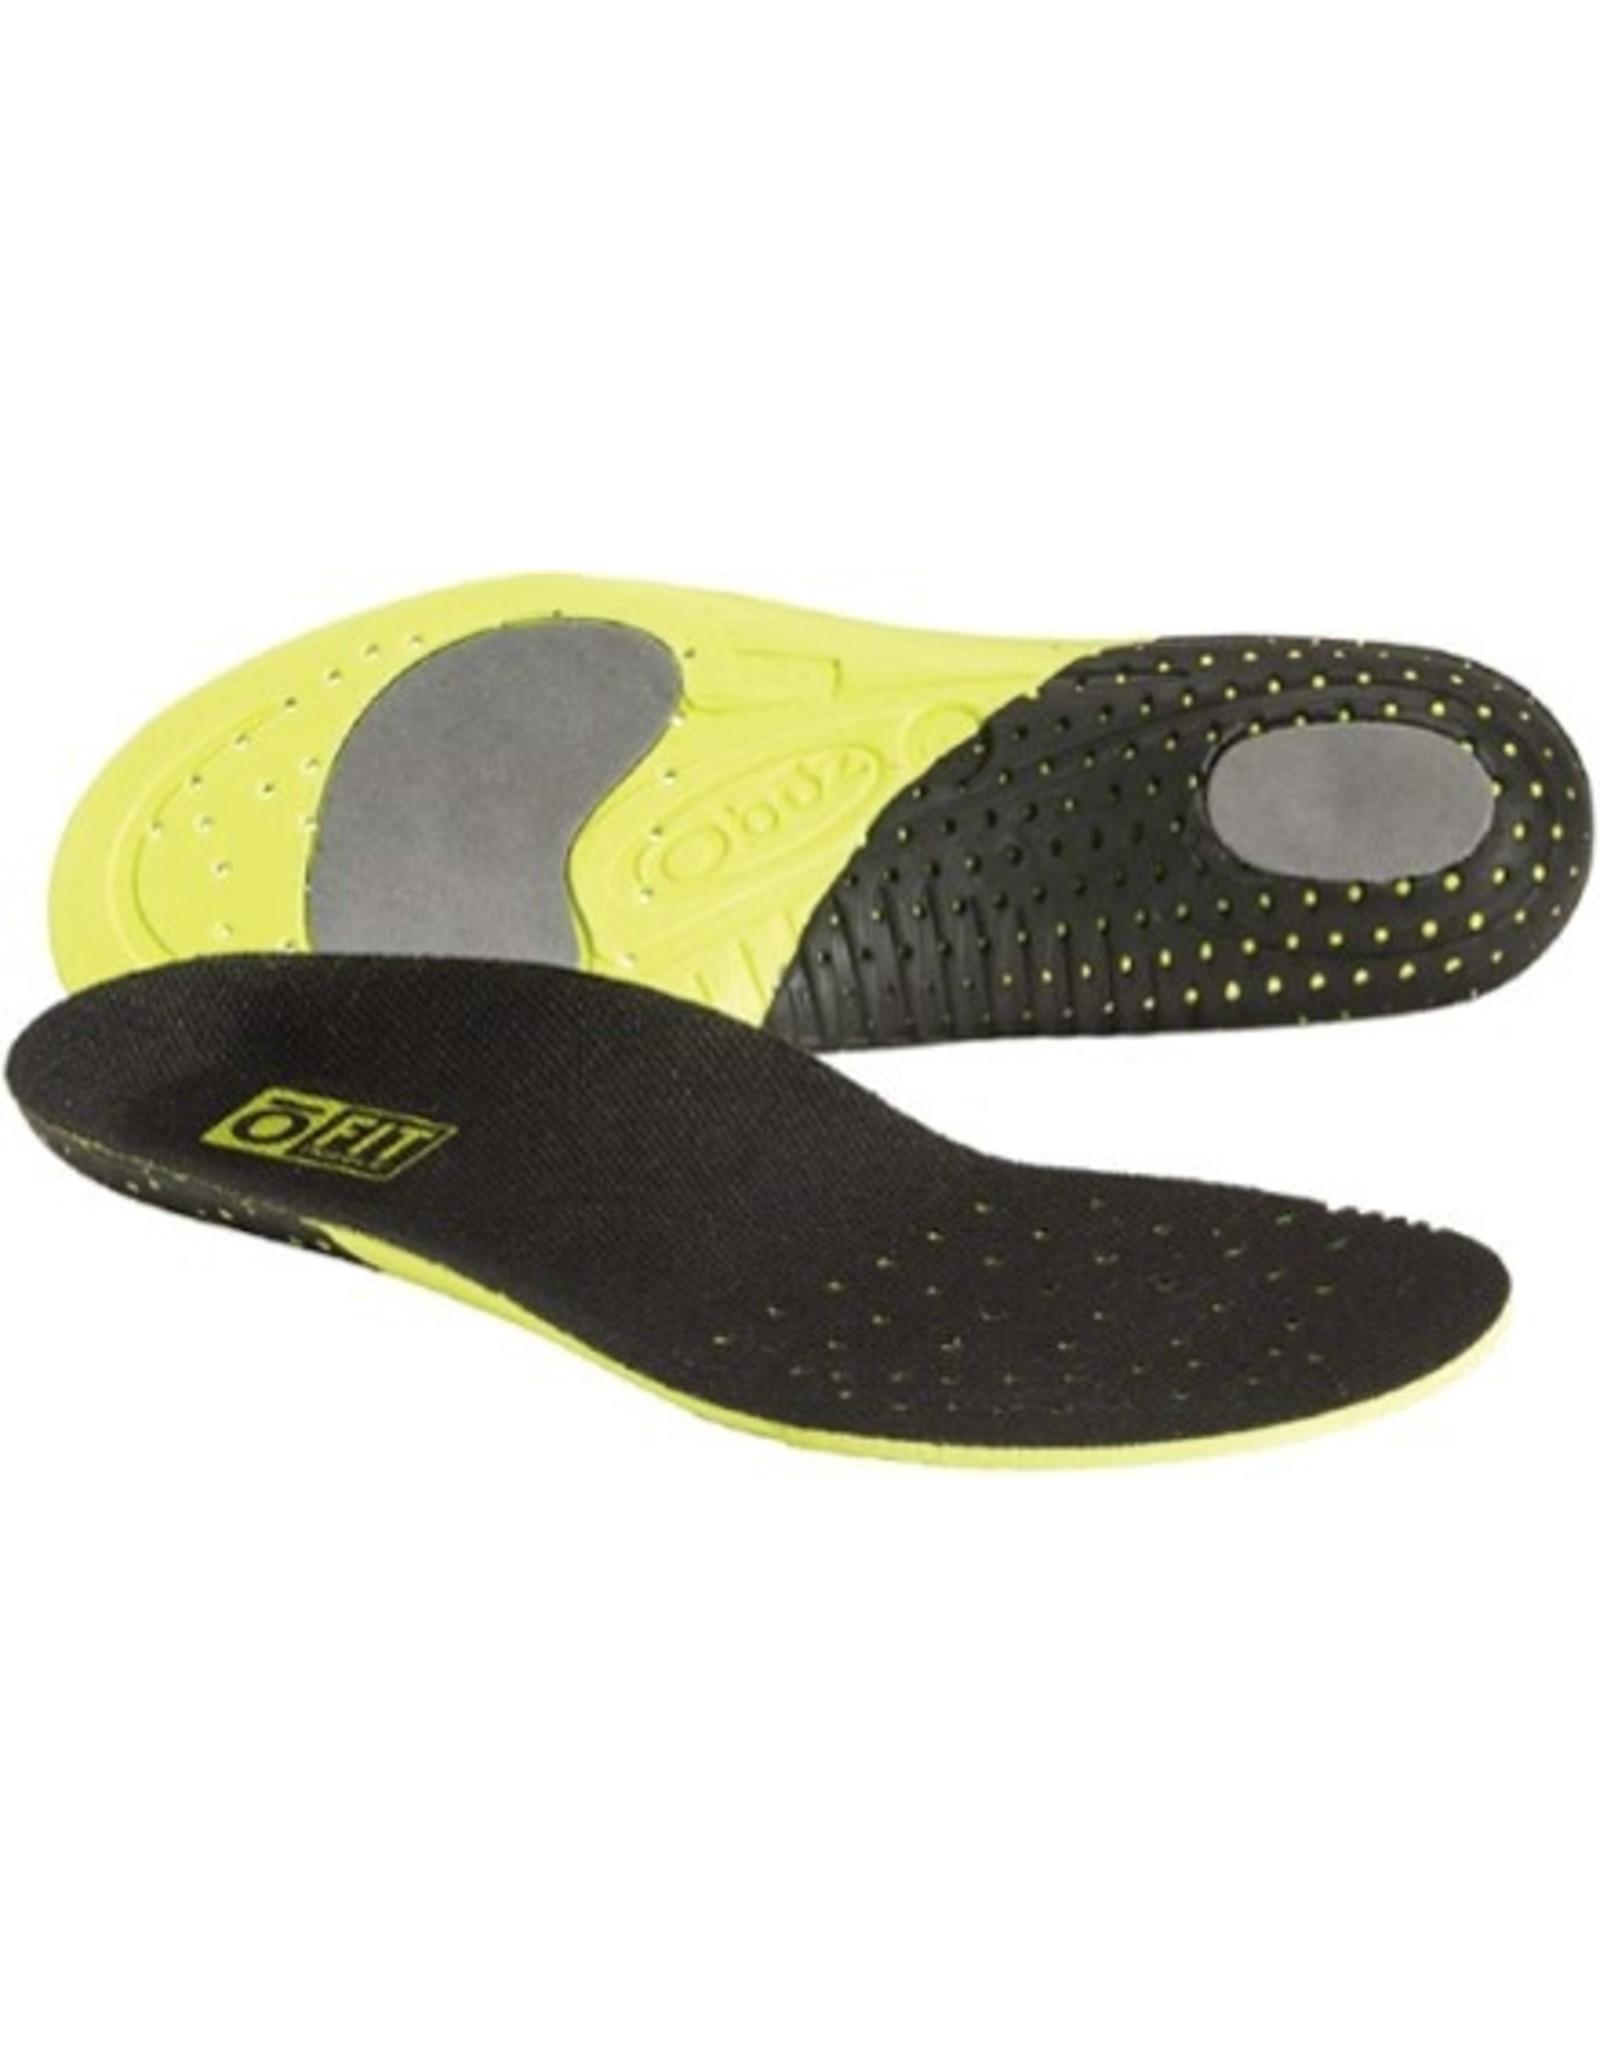 Oboz Footwear Oboz Livingston Low Men's Dark Shadow 8.5